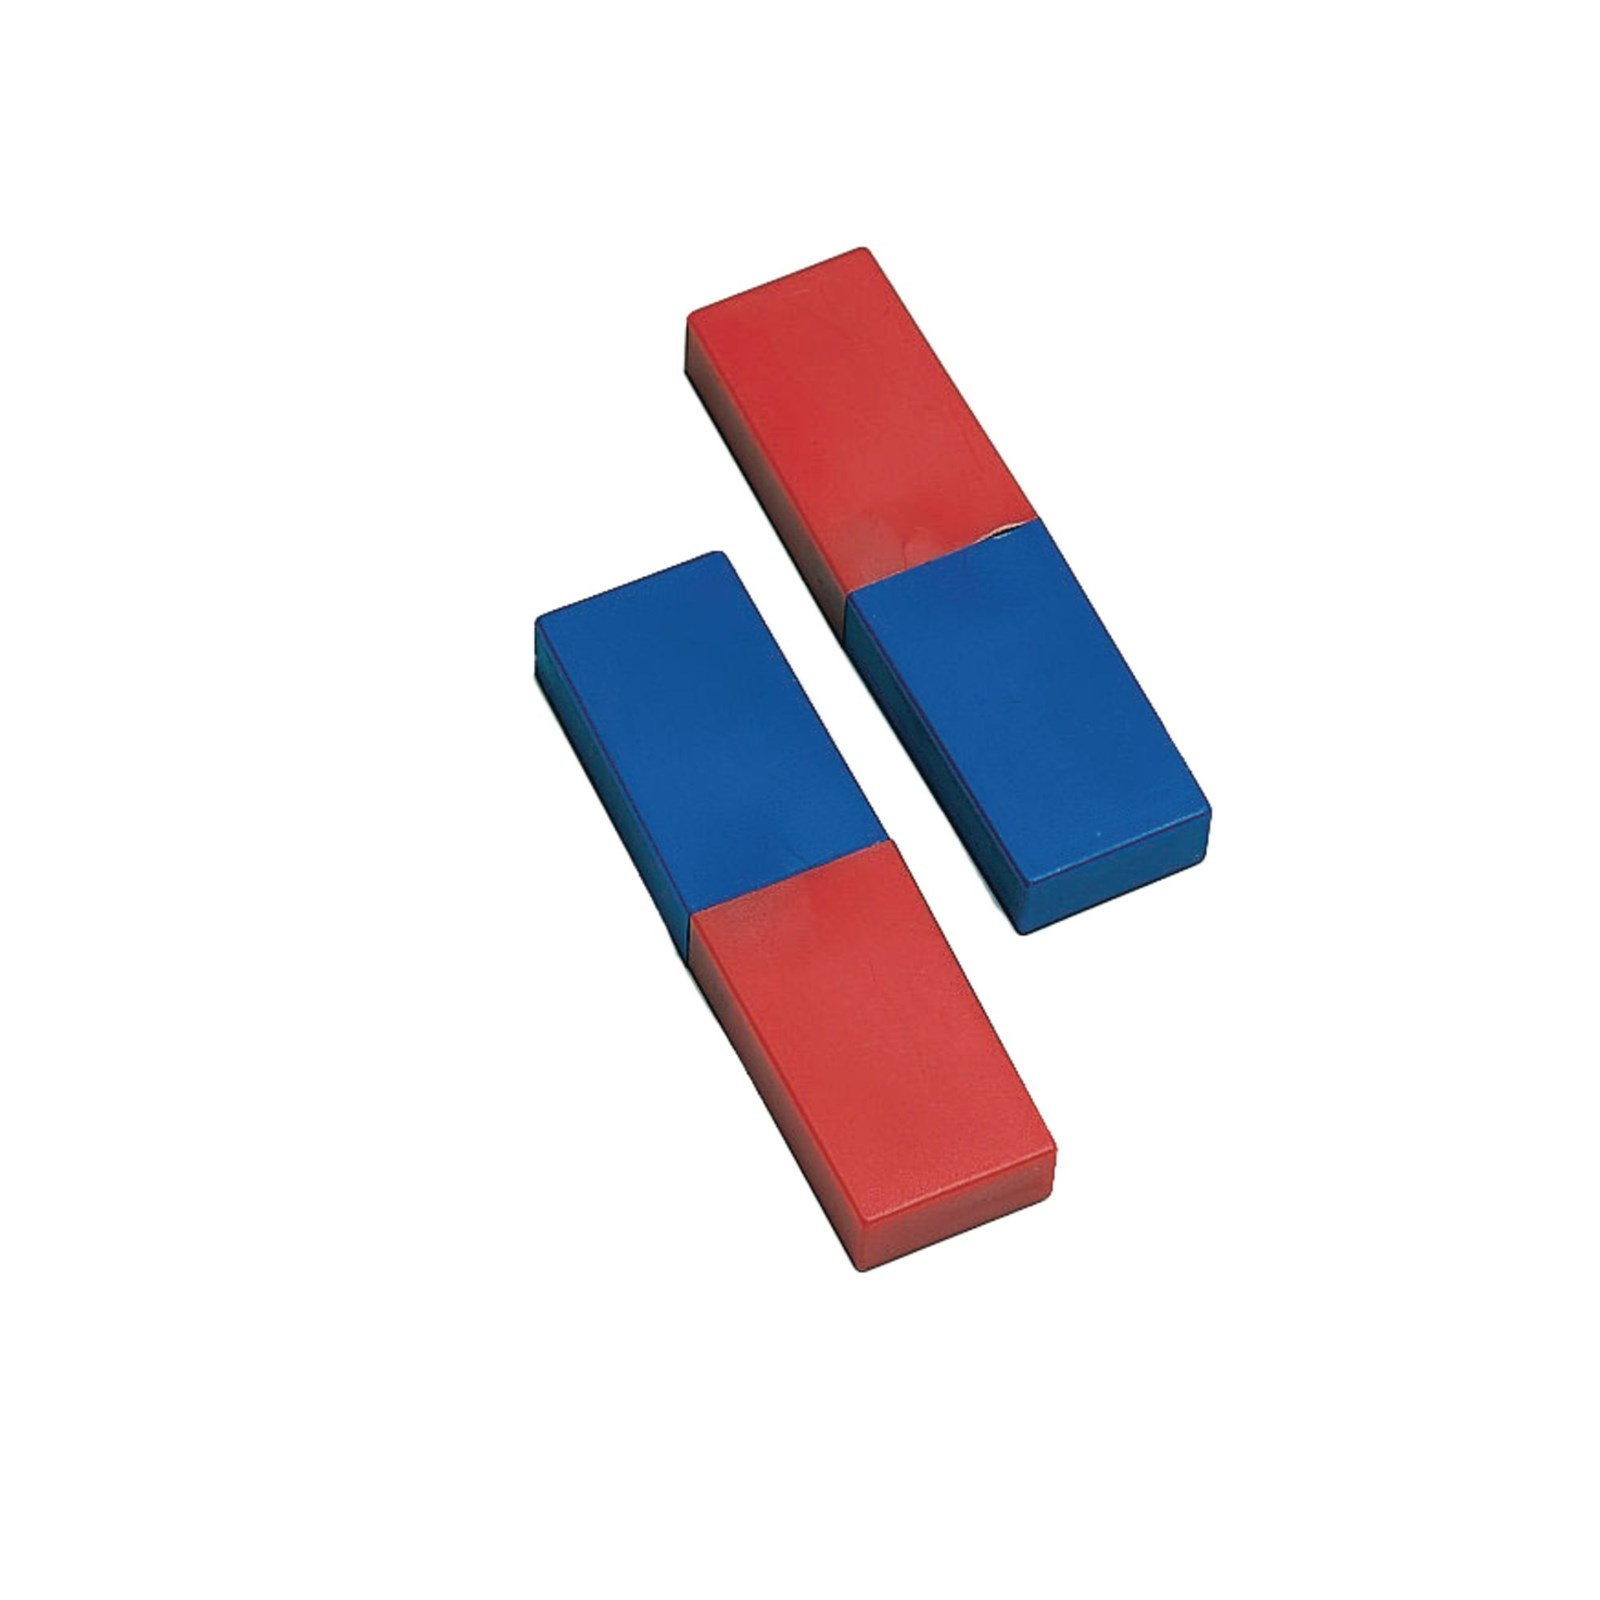 Bar Magnets, Plastic Coated Ceramic